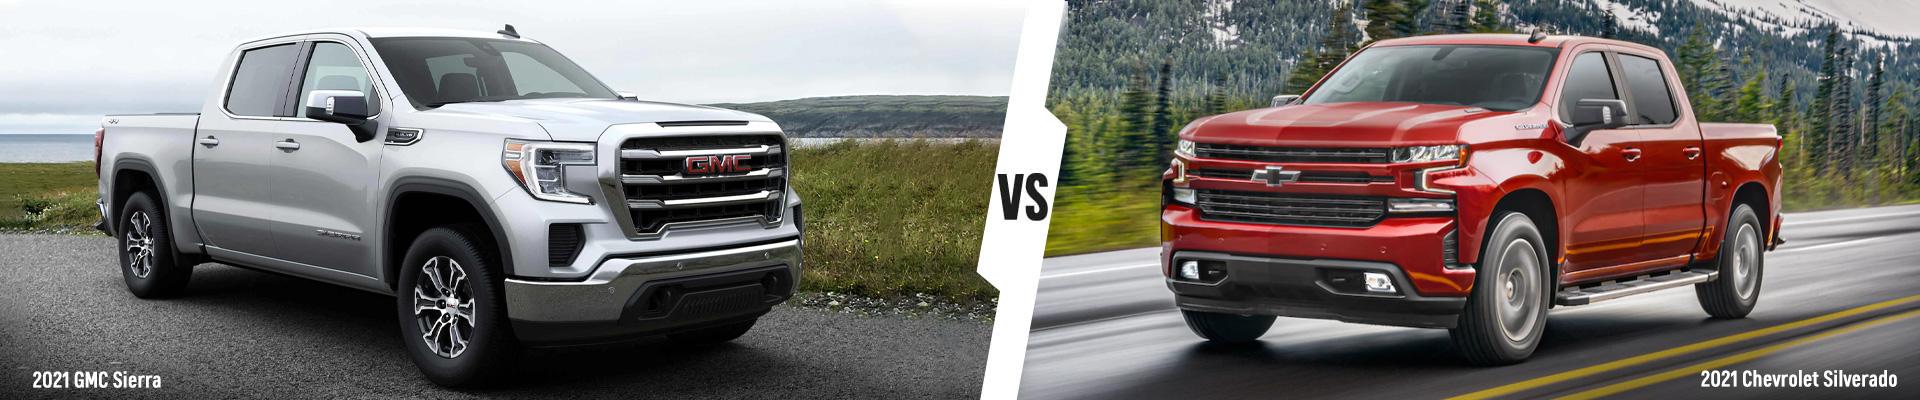 How the 2021 Chevrolet Silverado 1500 & 2021 GMC Sierra 1500 Compare